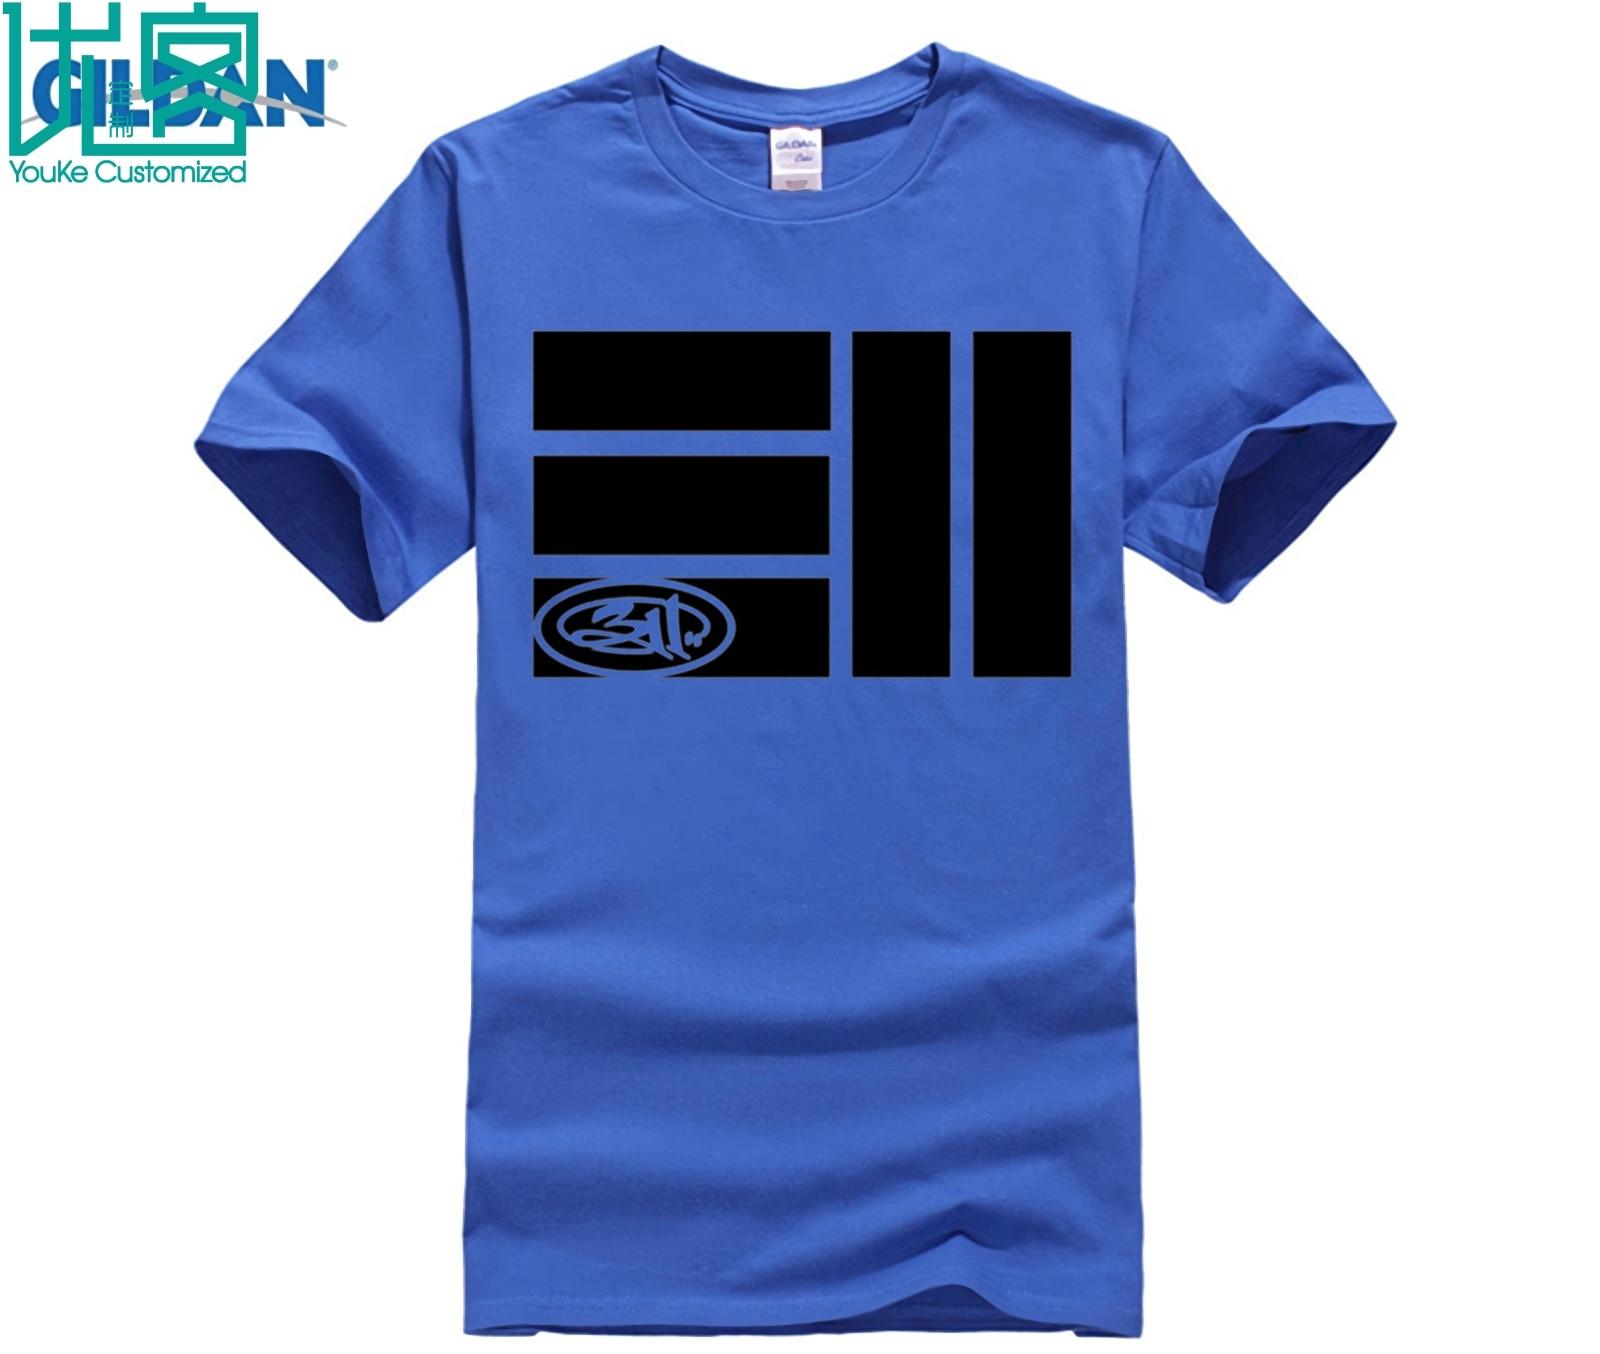 Mannen fashion brand t-shirt 311 Band Album Logo Ronde Up Fashion Geek Tee 2017 Nieuwe Mannen T-shirts Korte mouw Tee Shirt